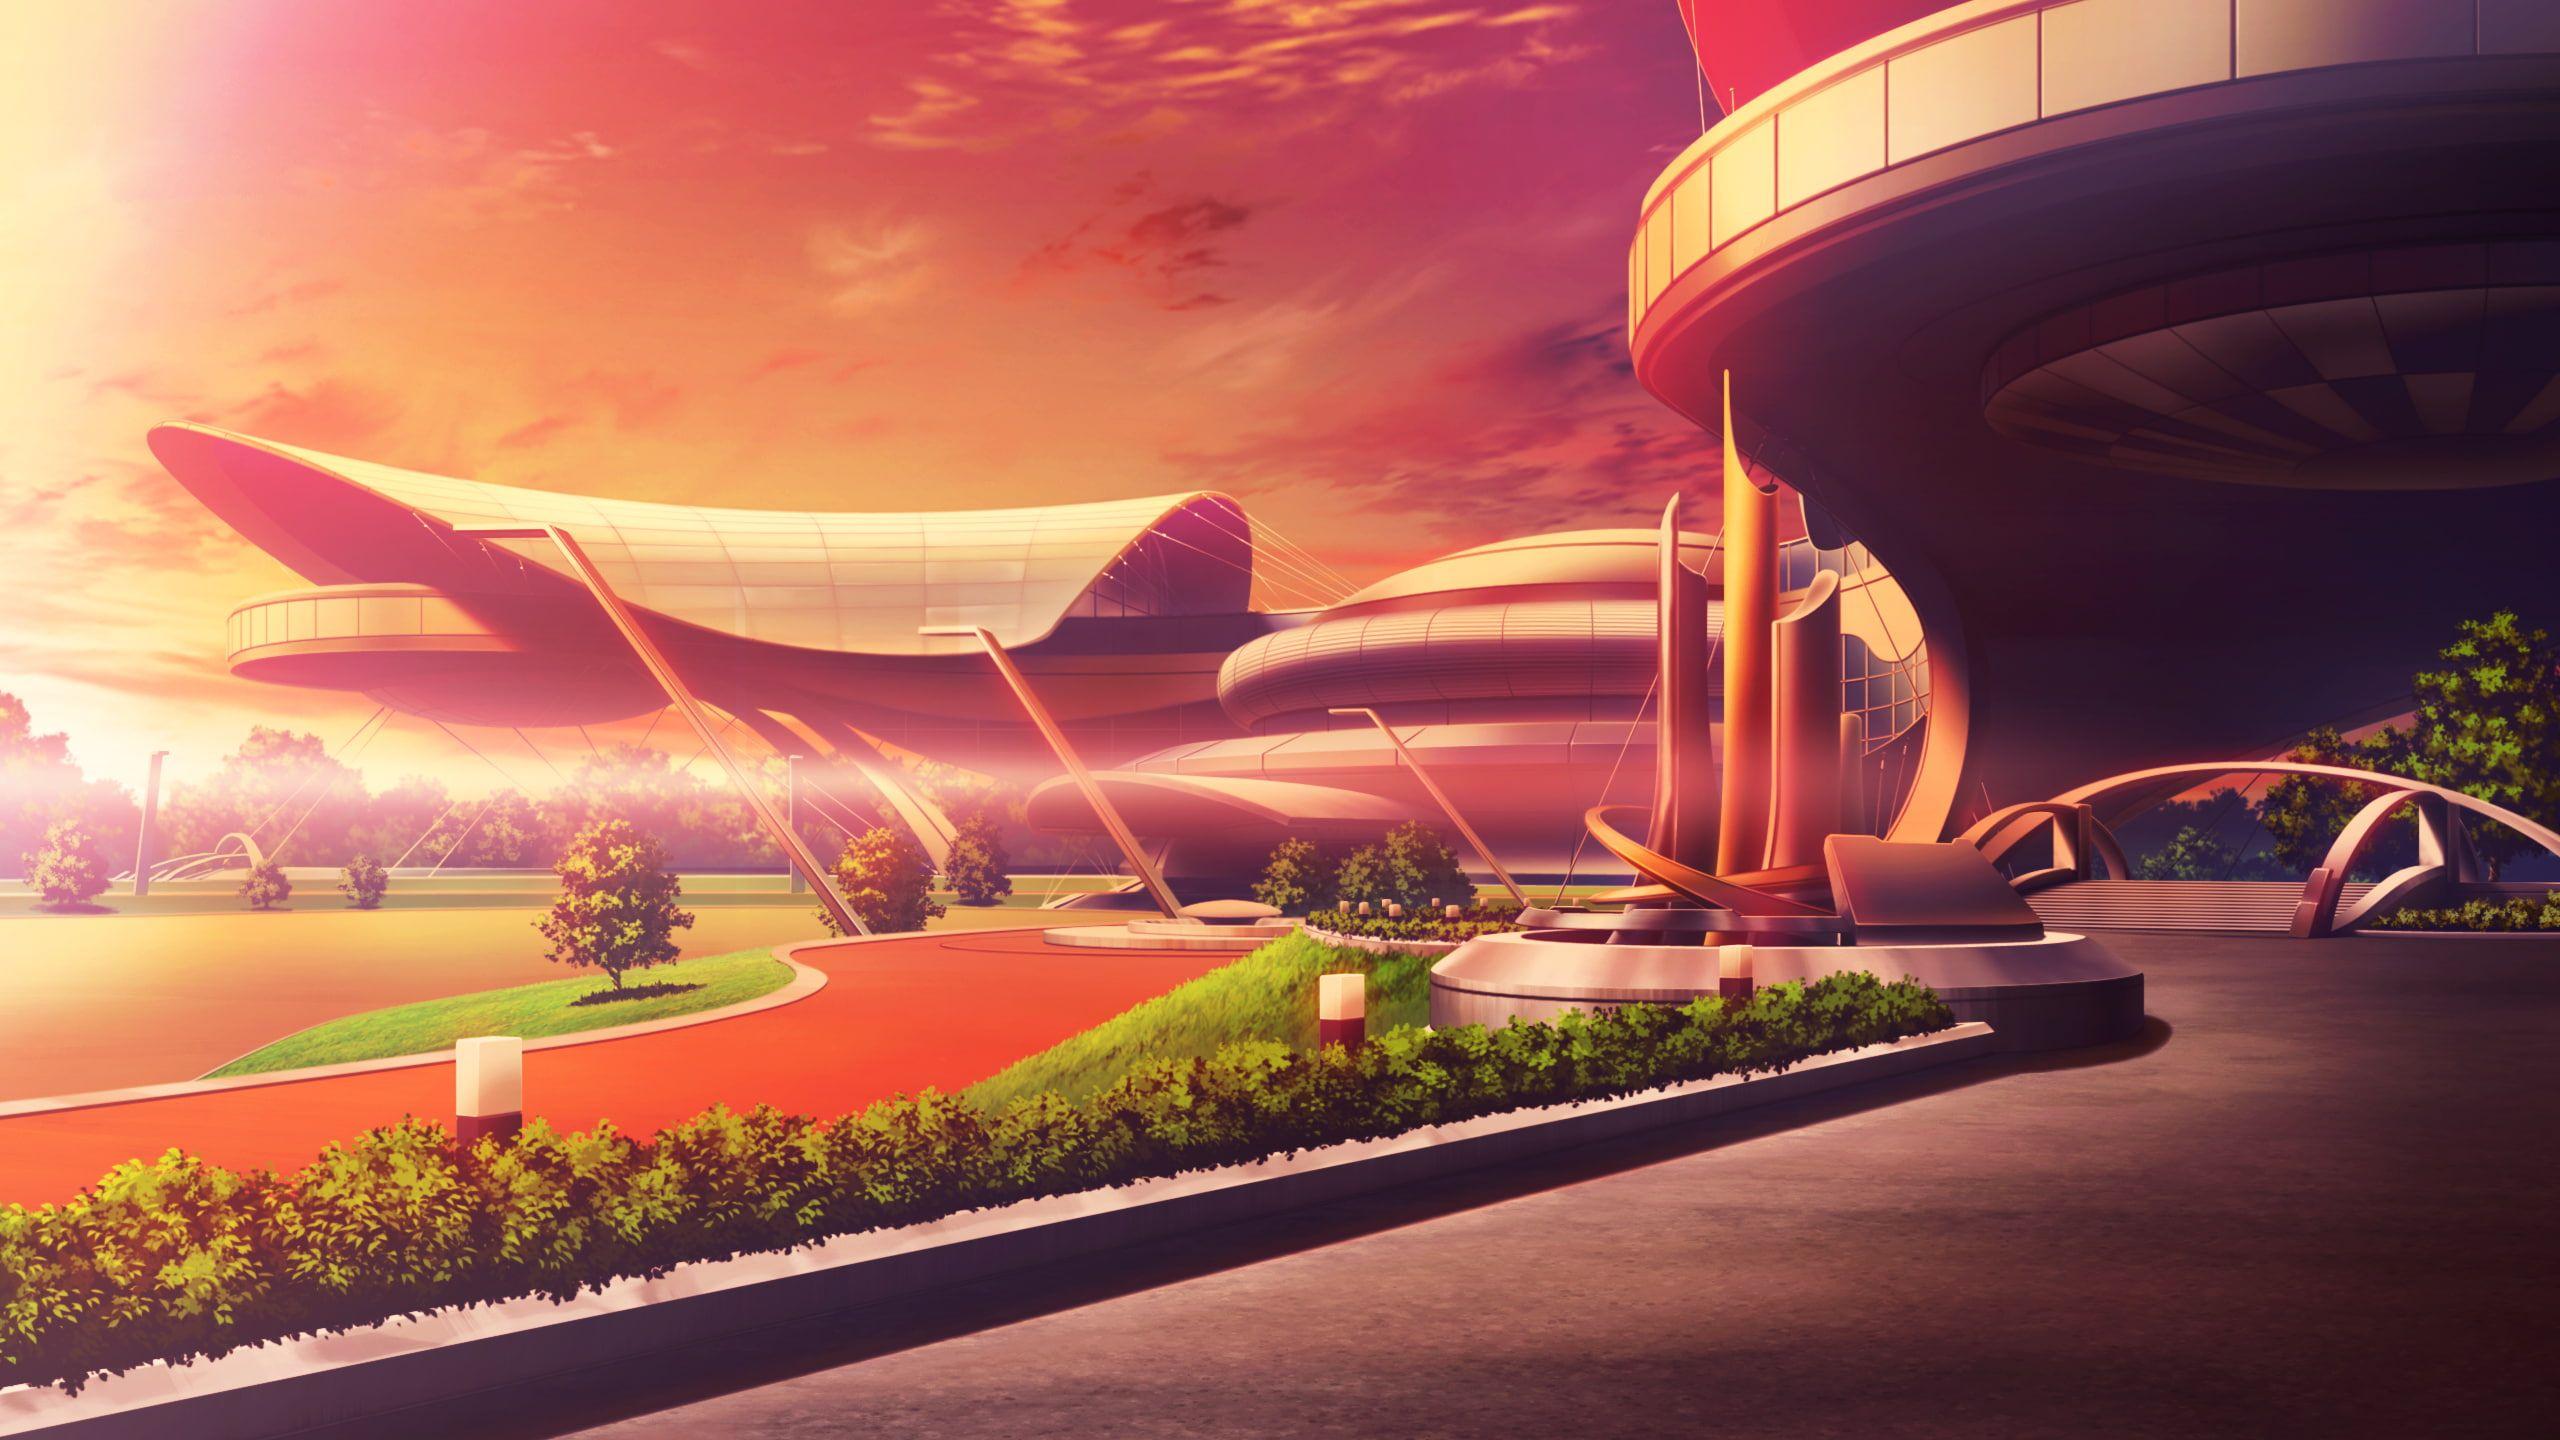 Building Game Hirogete Kono Oozora Scenic Sunset Tsubasa